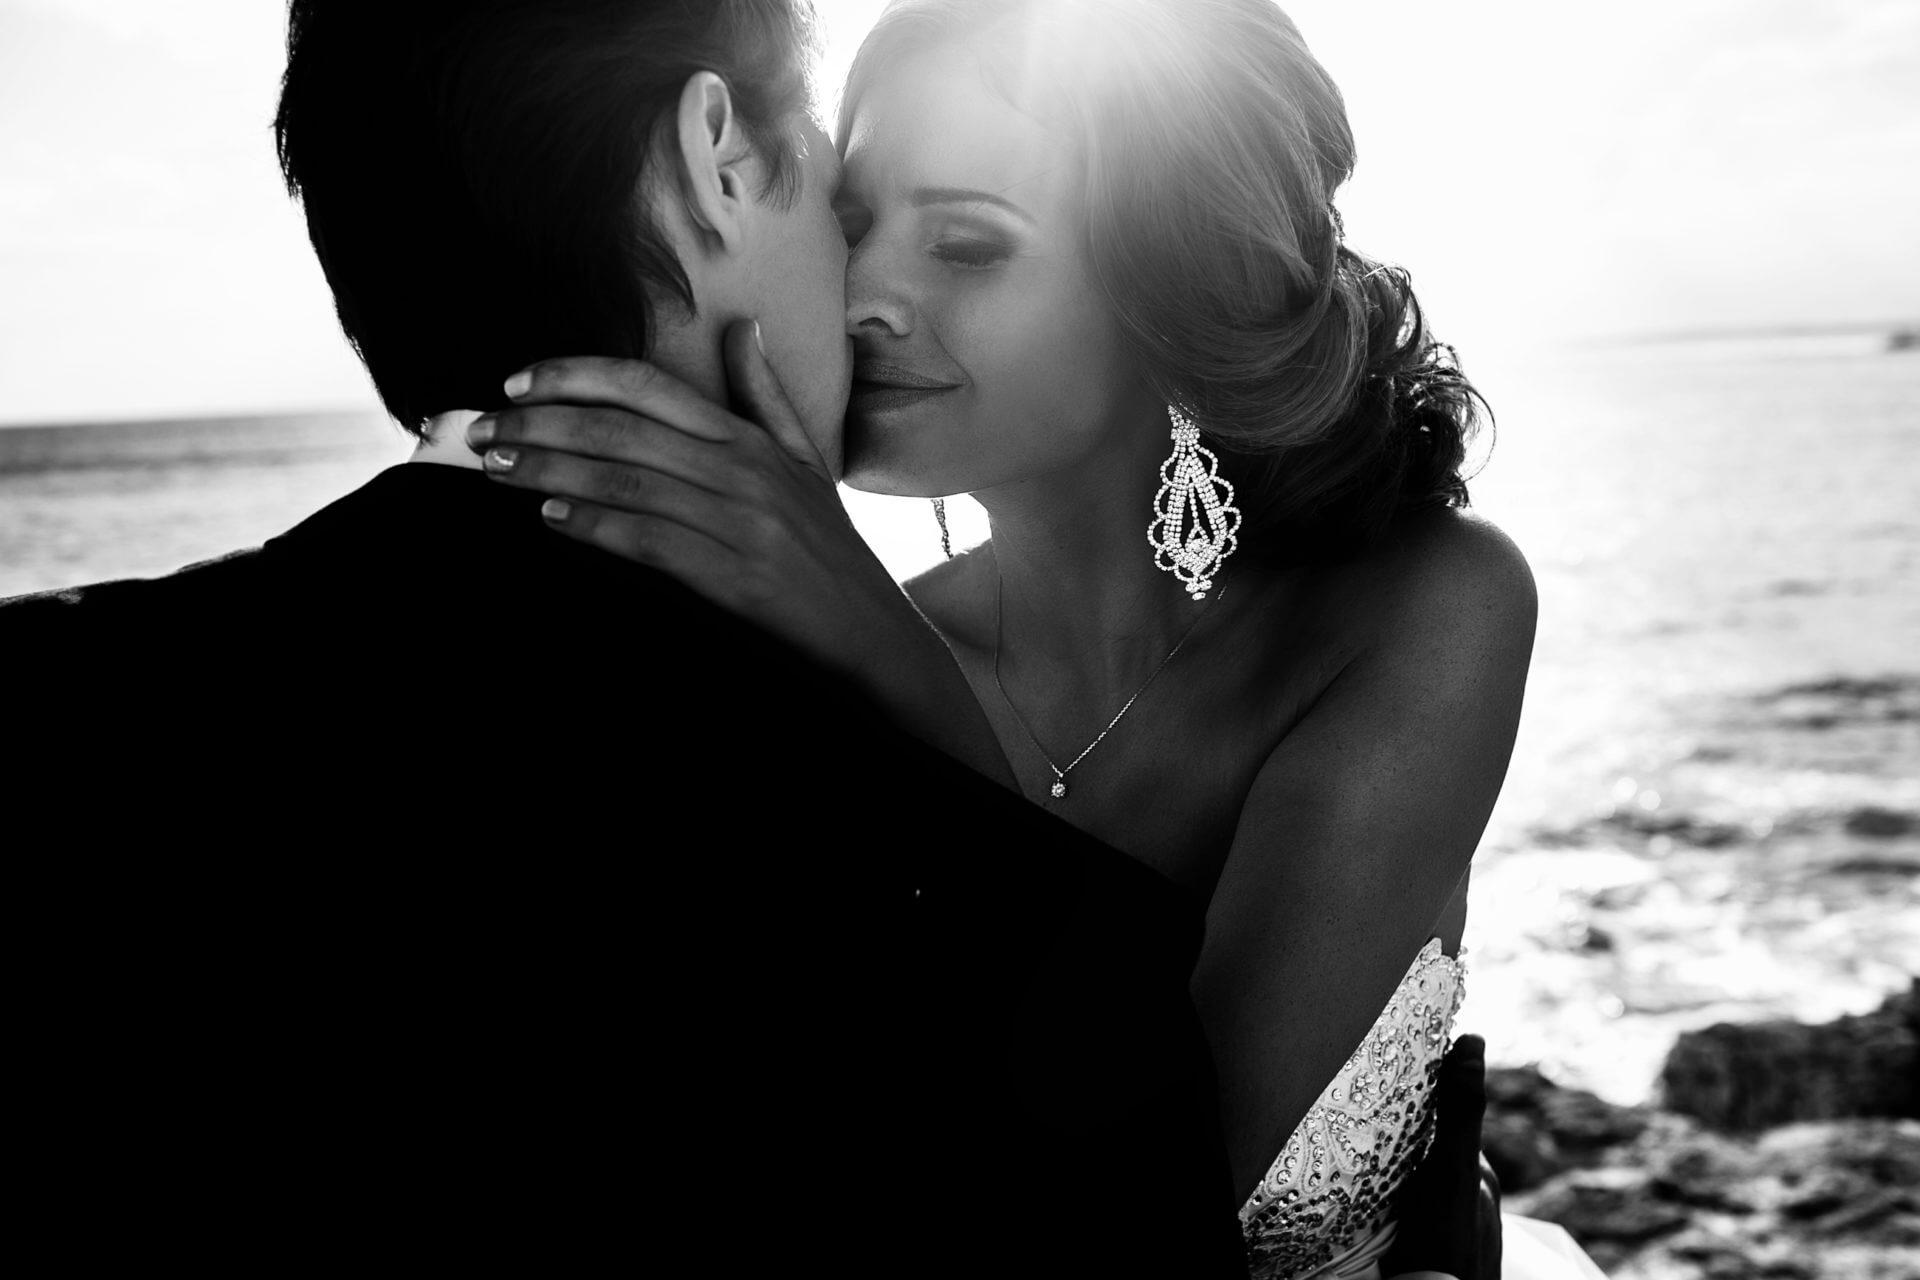 Destination wedding planner Ibiza - Your Weddings & Events